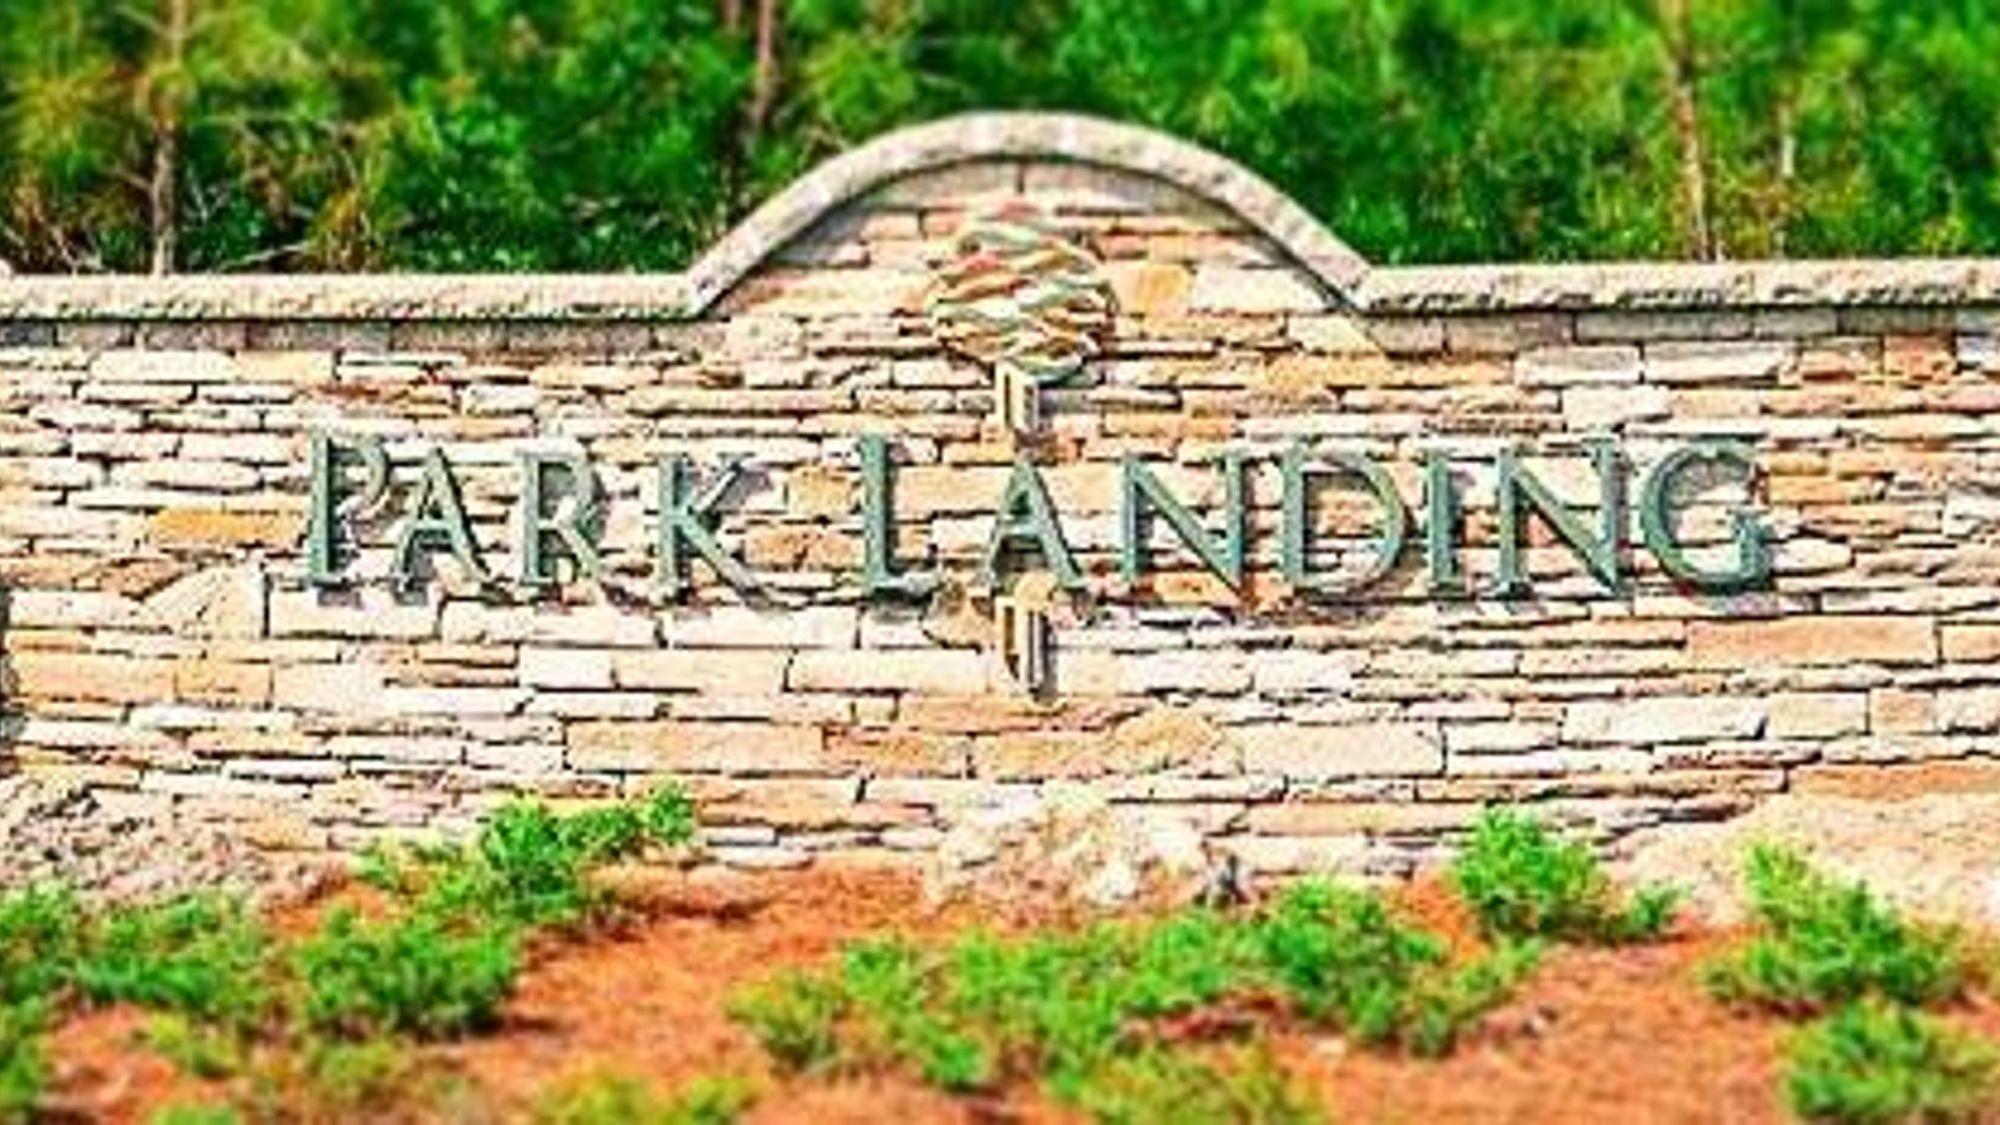 Park Landing